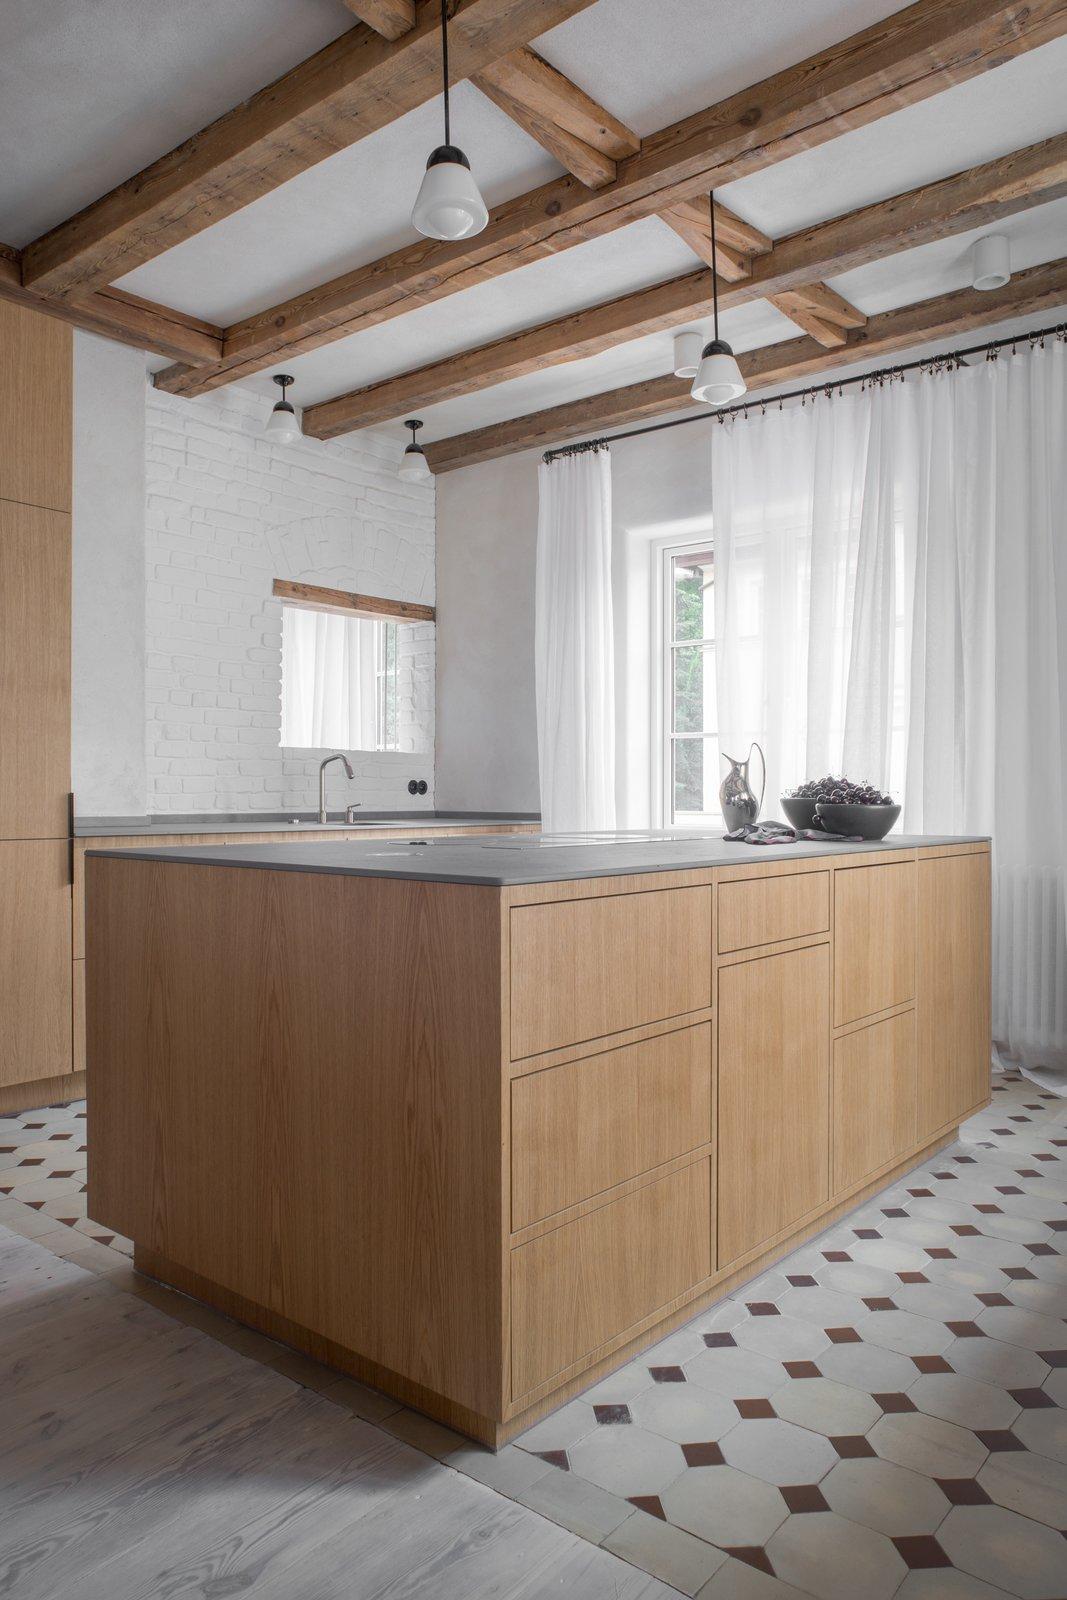 Loft Kolasiński kitchen with oak island